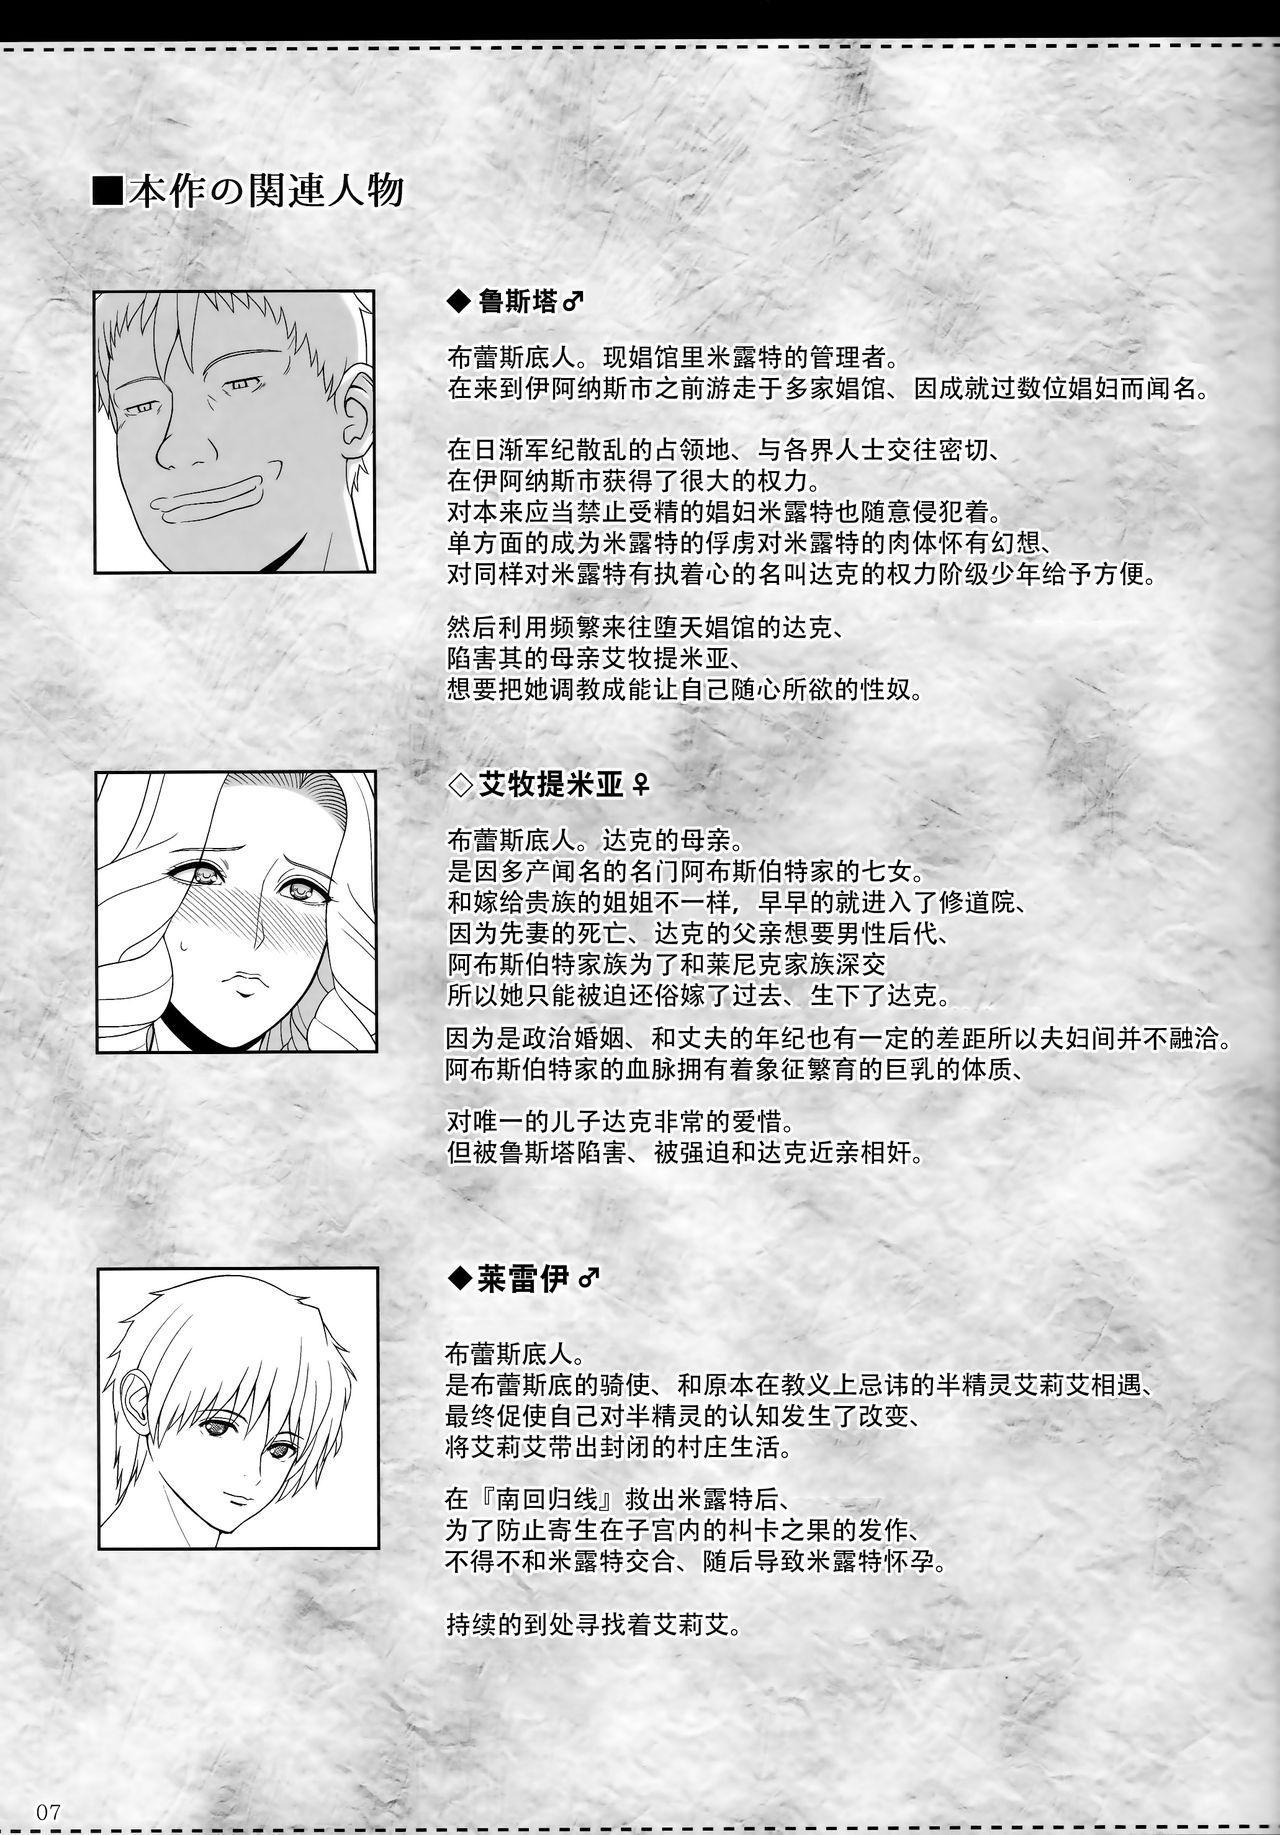 El toiu Shoujo no Monogatari X9 5